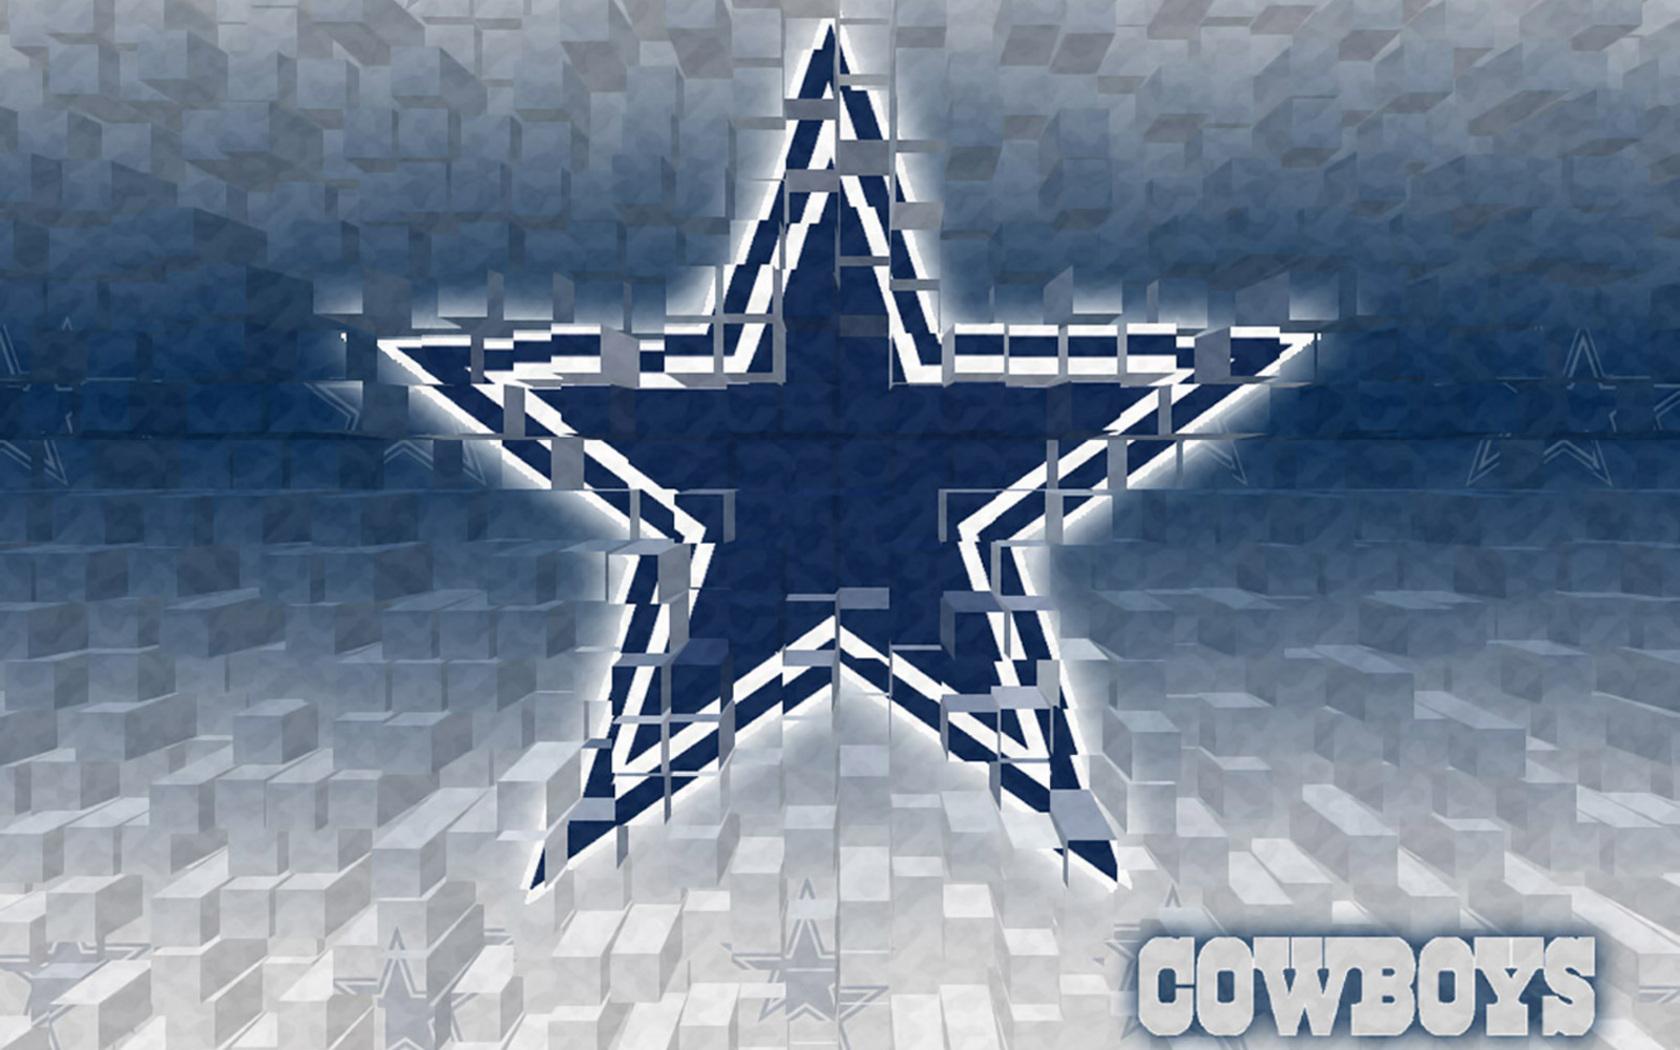 Enjoy our wallpaper of the week Dallas Cowboys wallpaper 1680x1050